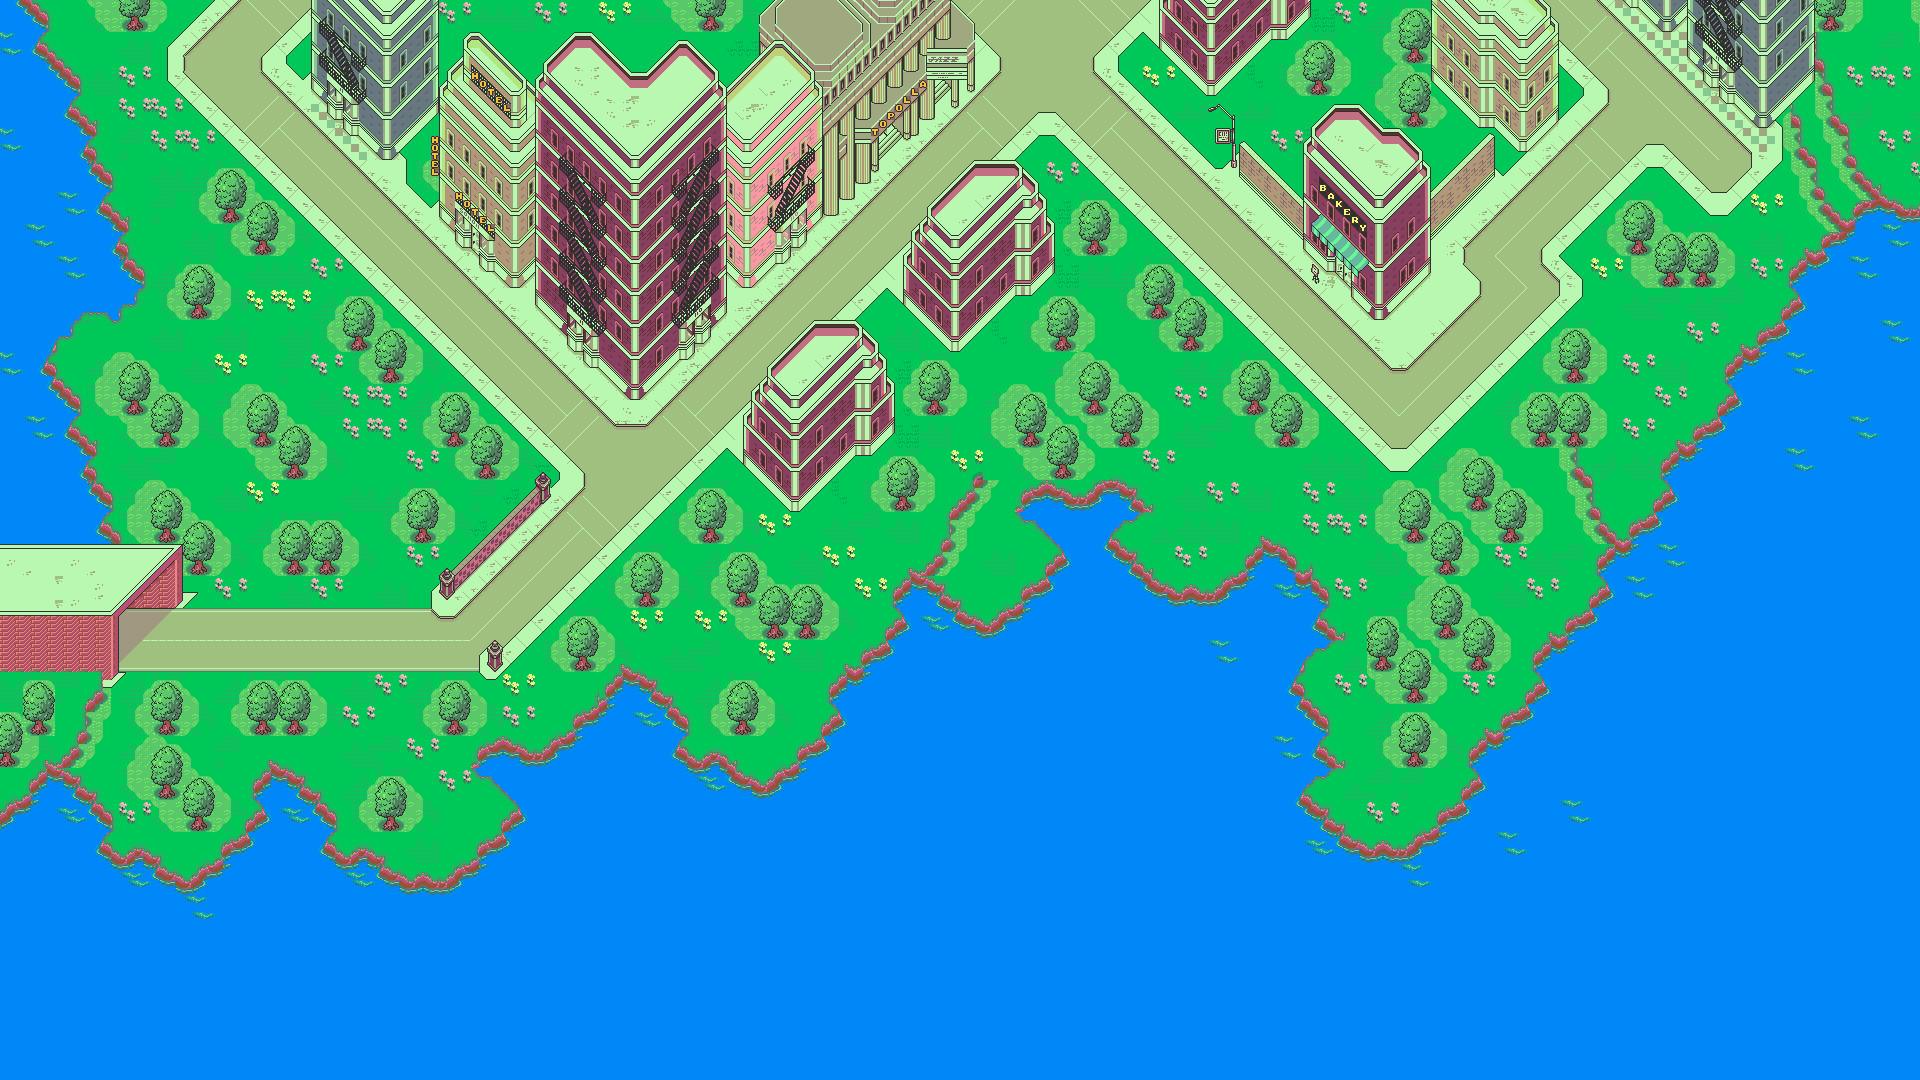 HD Earthbound Video Games Cityscapes Mother Pixelart Super Nintendo  Wallpaper.